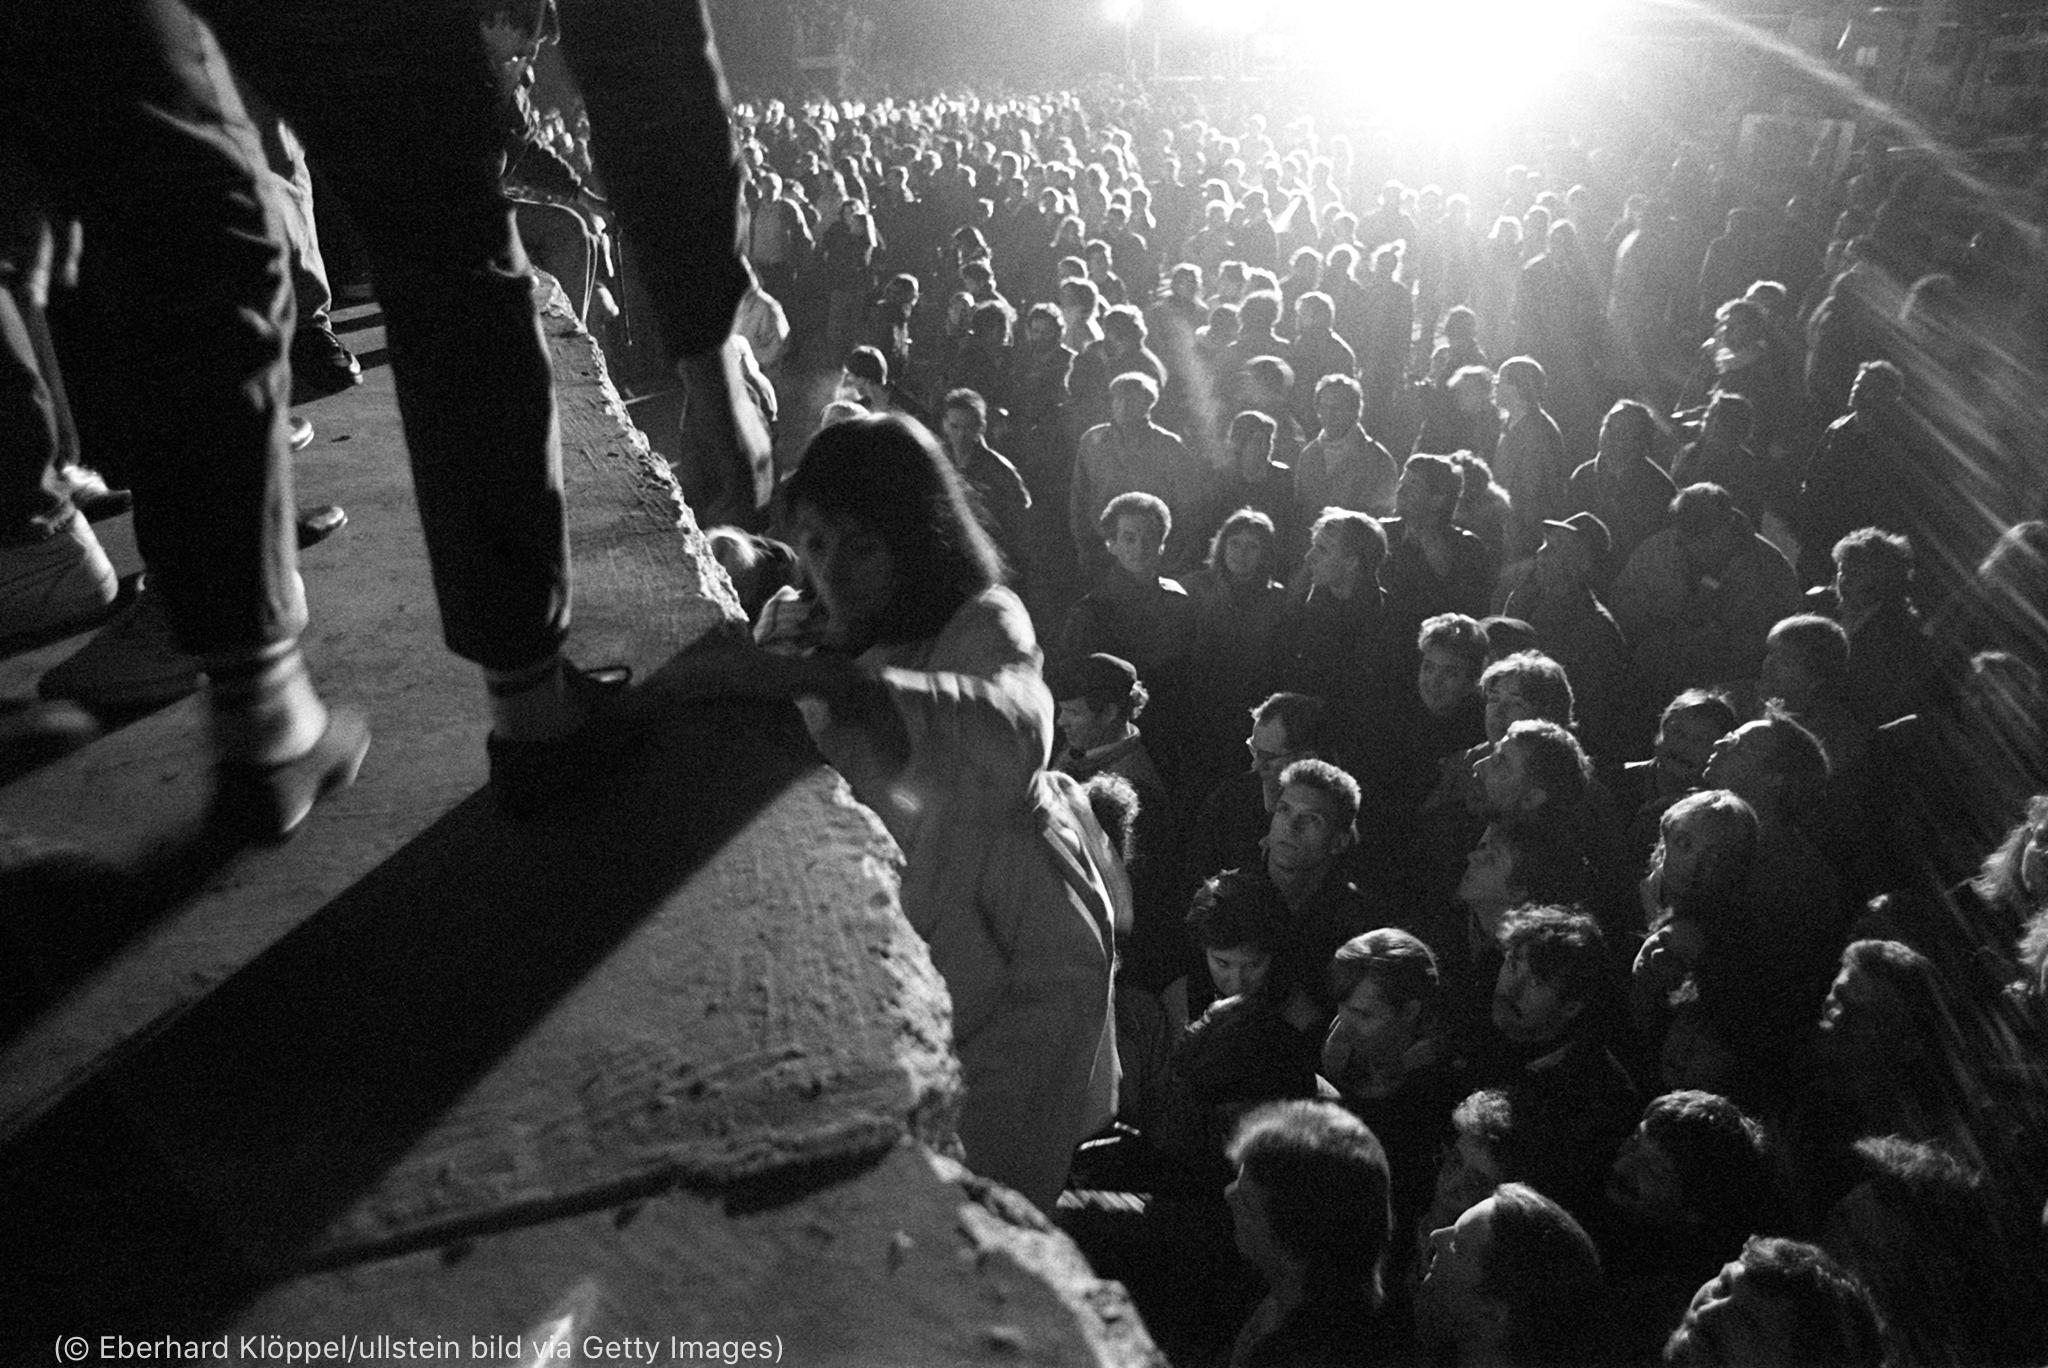 Woman climbing wall, crowd below her (© Eberhard Klöppel/ullstein bild via Getty Images)